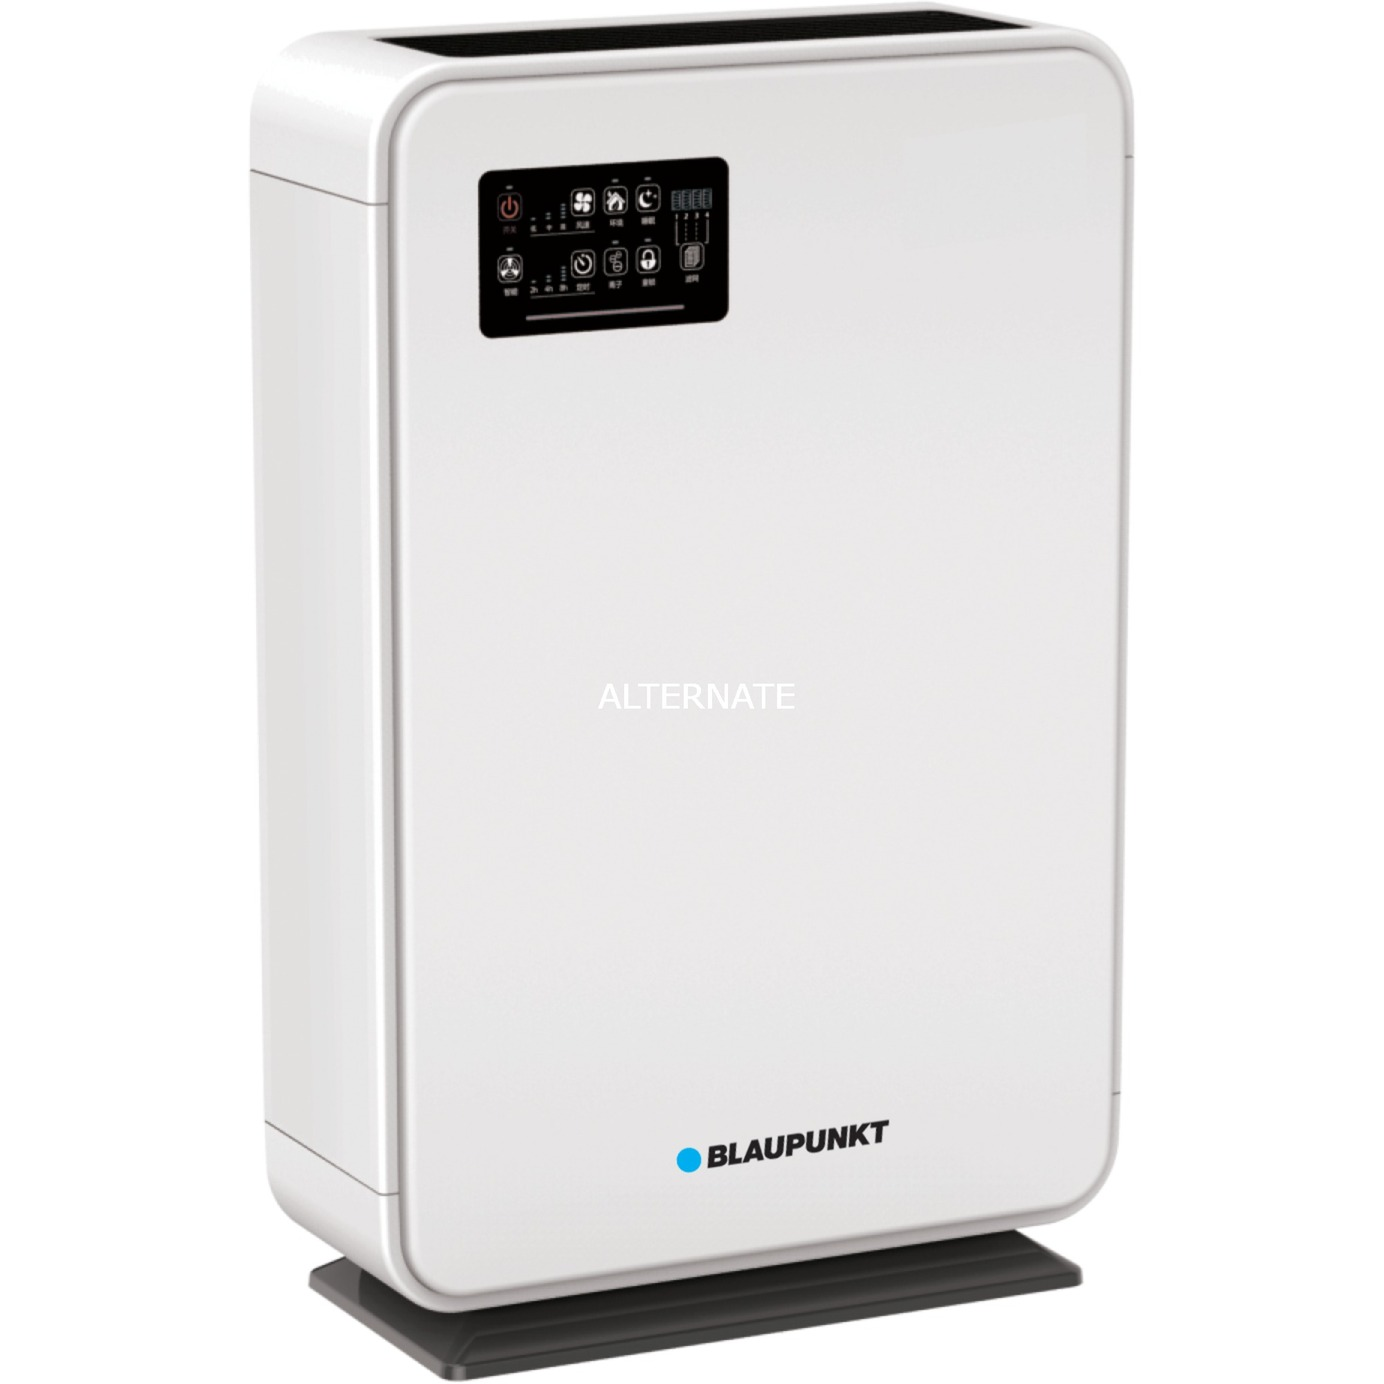 BAP-HC-I2041-X18X, Purificador de aire